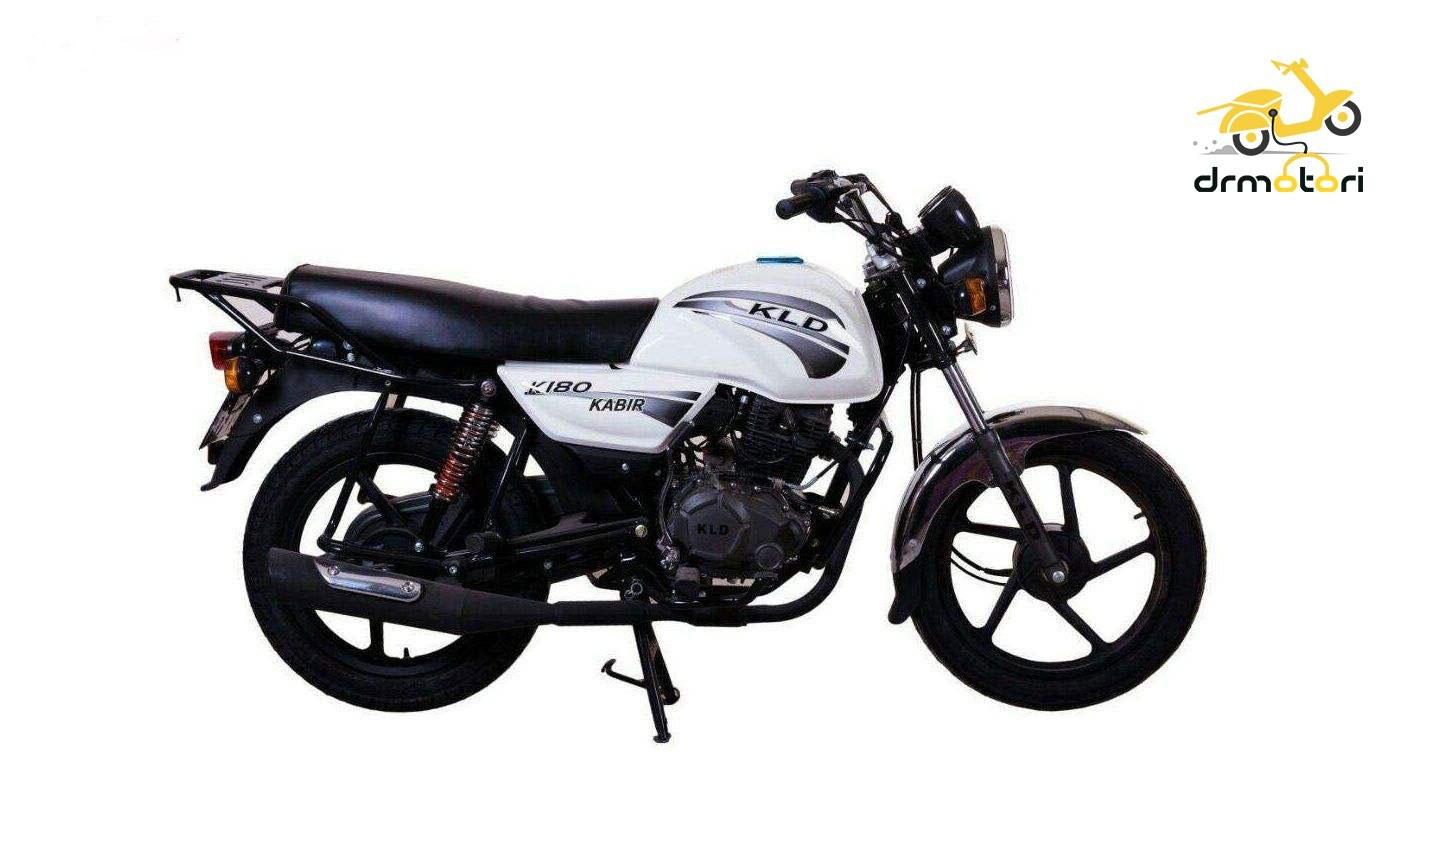 موتورسیکلت kld 180